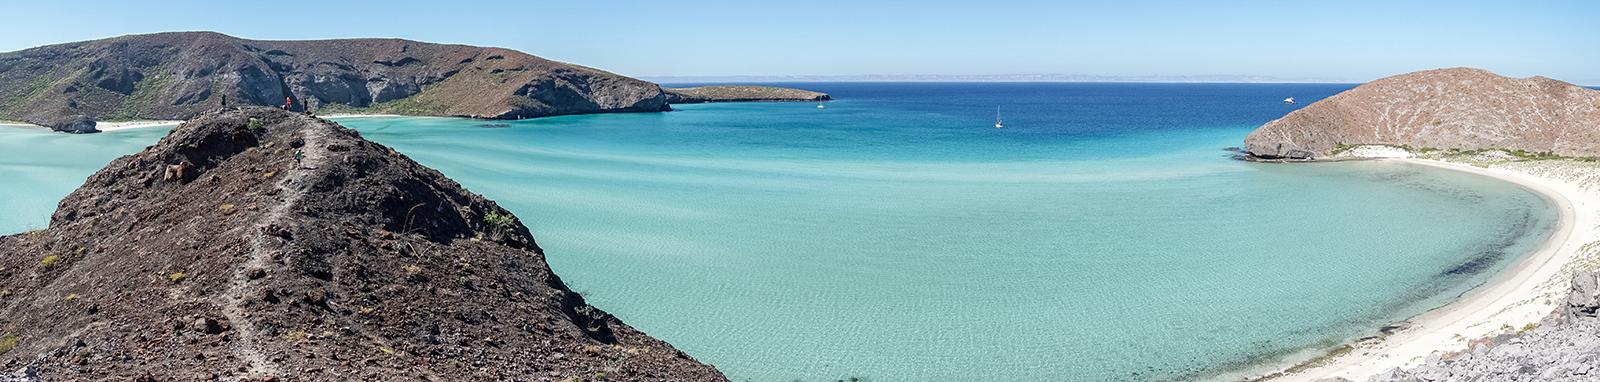 playa Balandra la paz